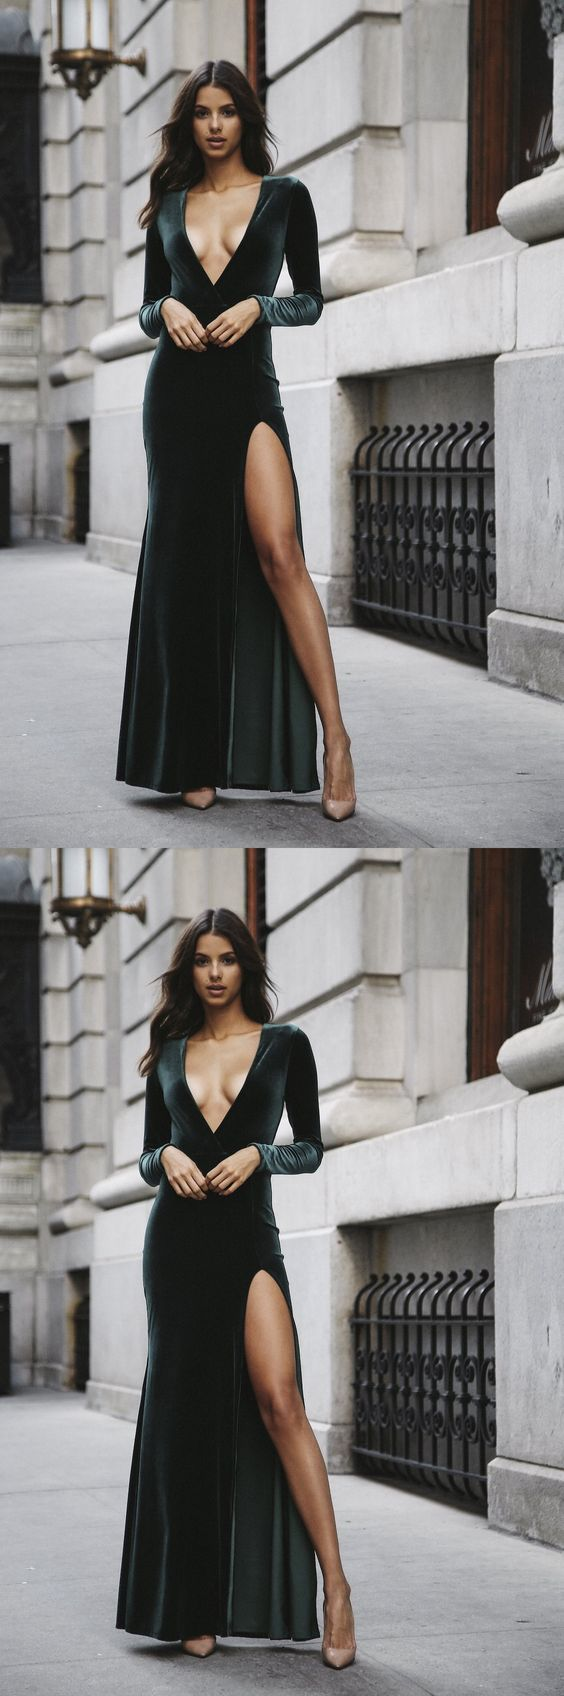 Popular Dark Green Prom Dress,Long Sleeves Party Dress,Deep V-Neck Sexy Prom